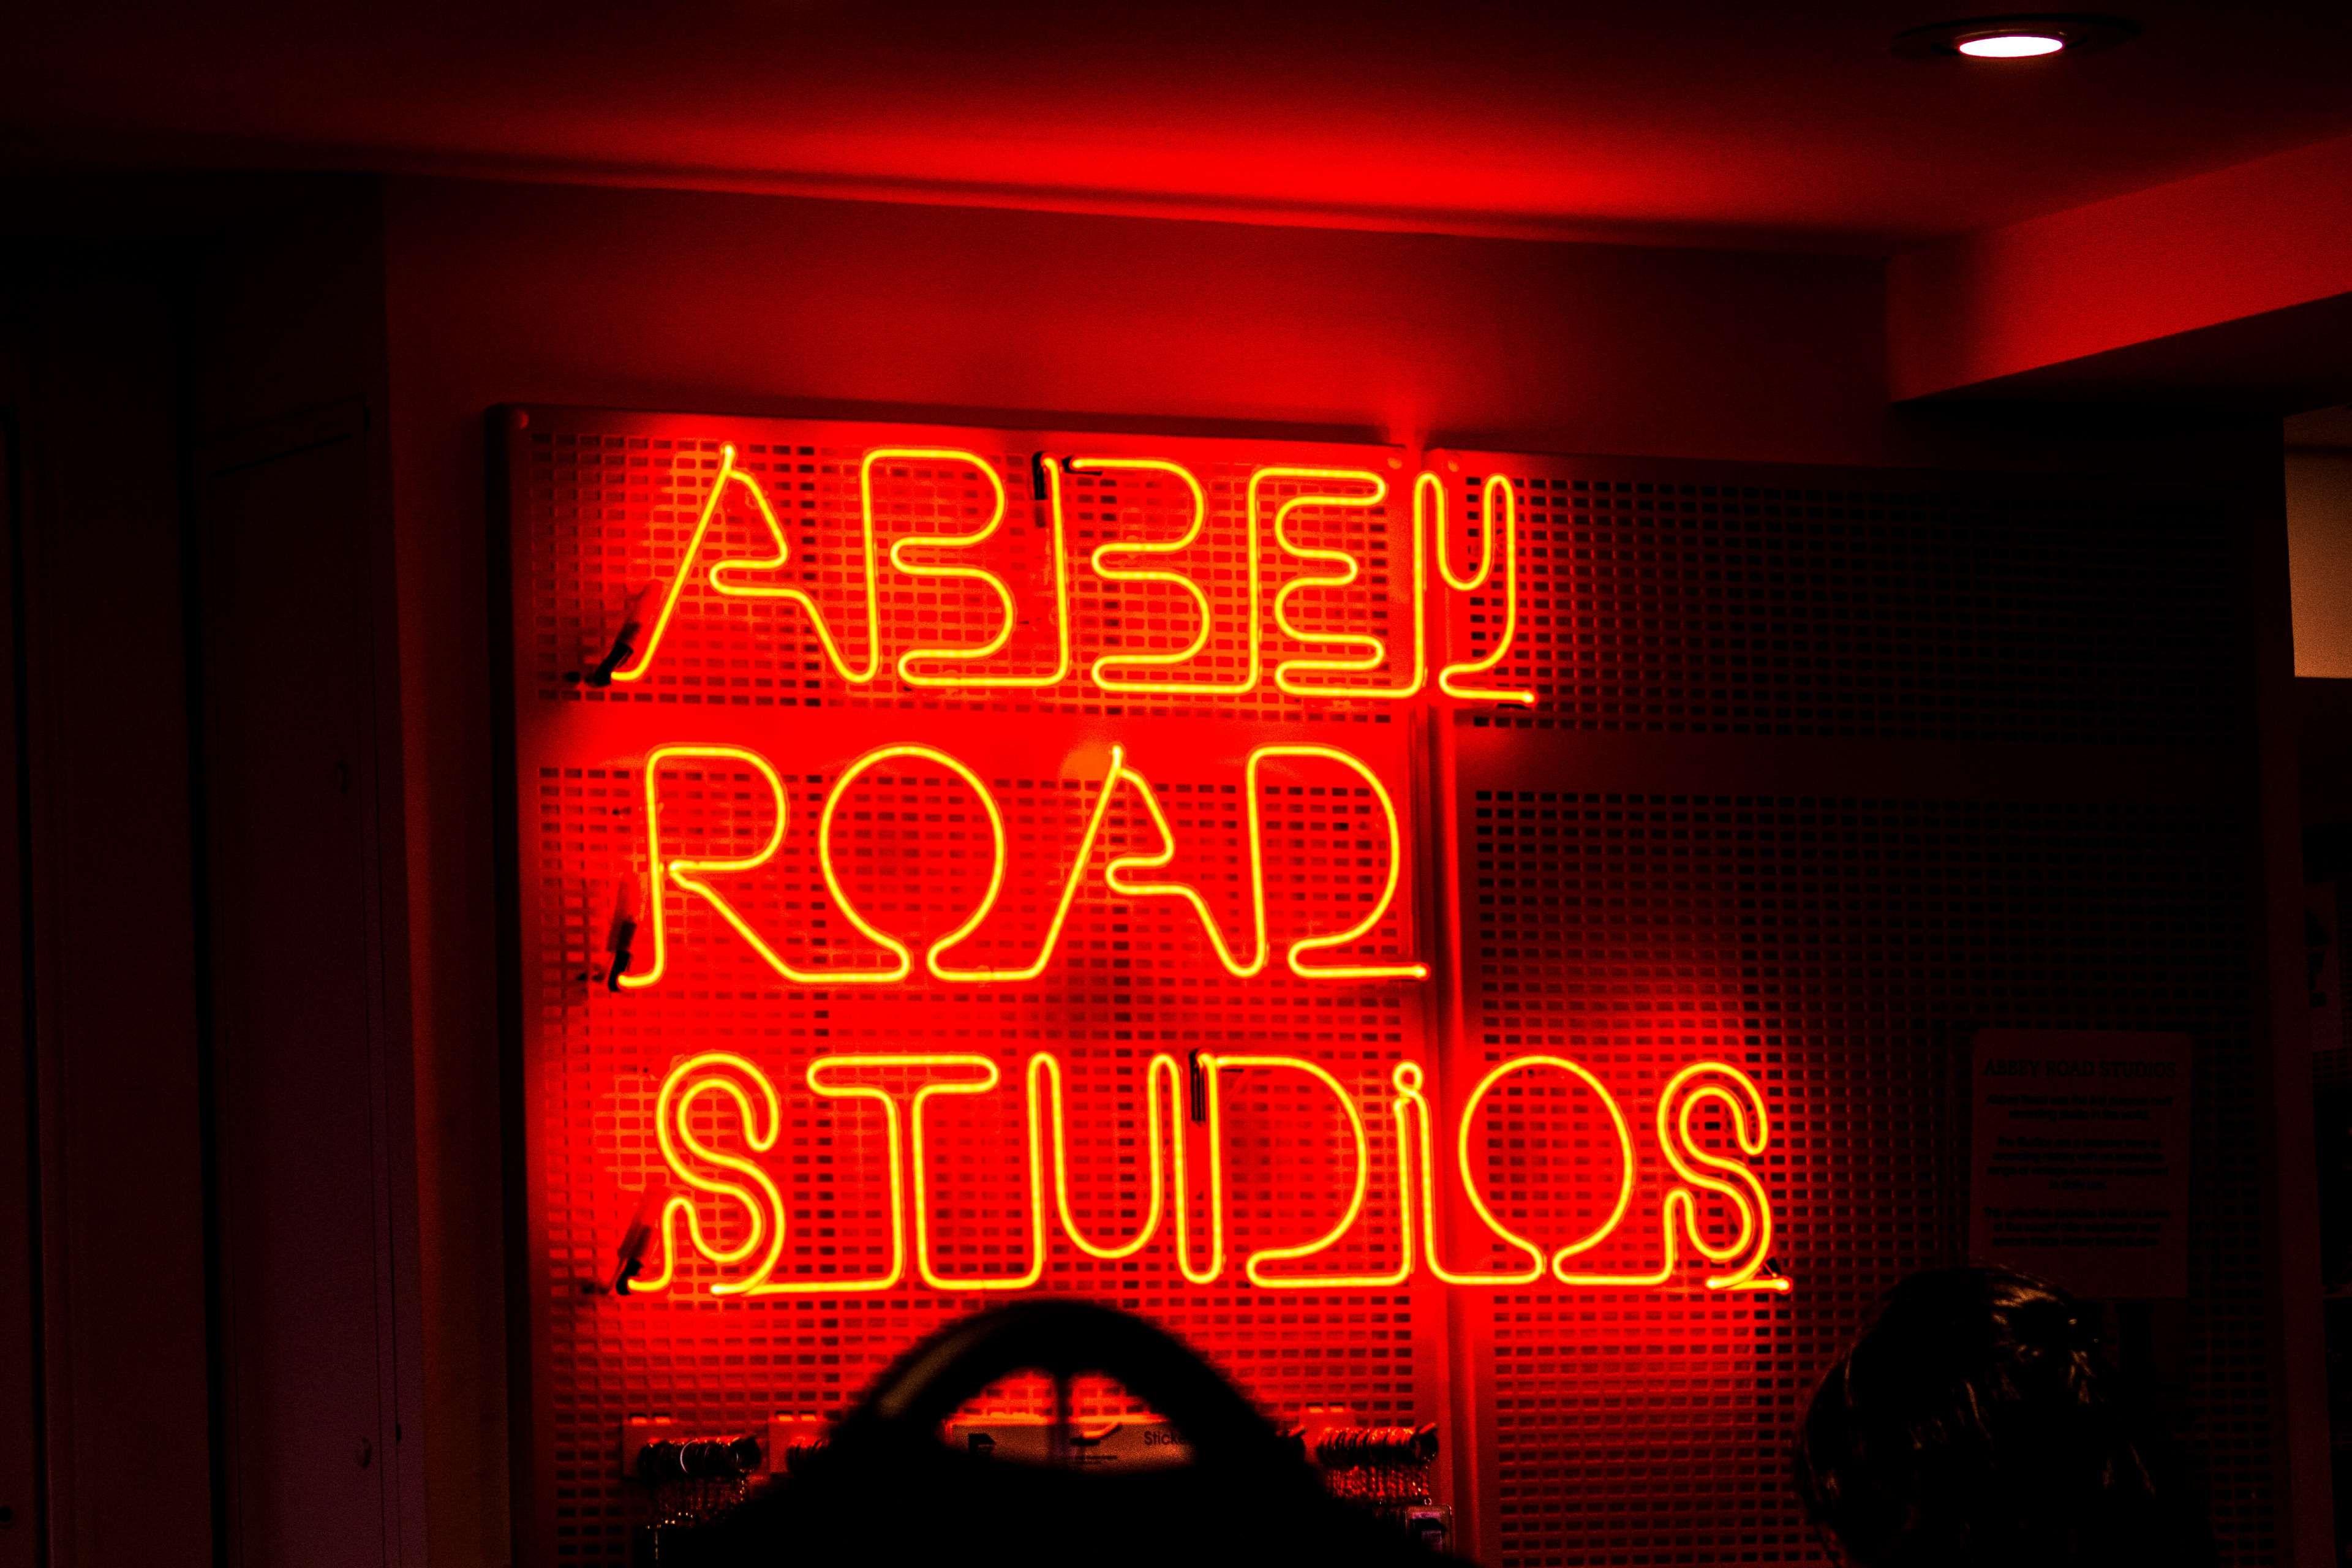 abstract, advertisement, art, blur, bright, business